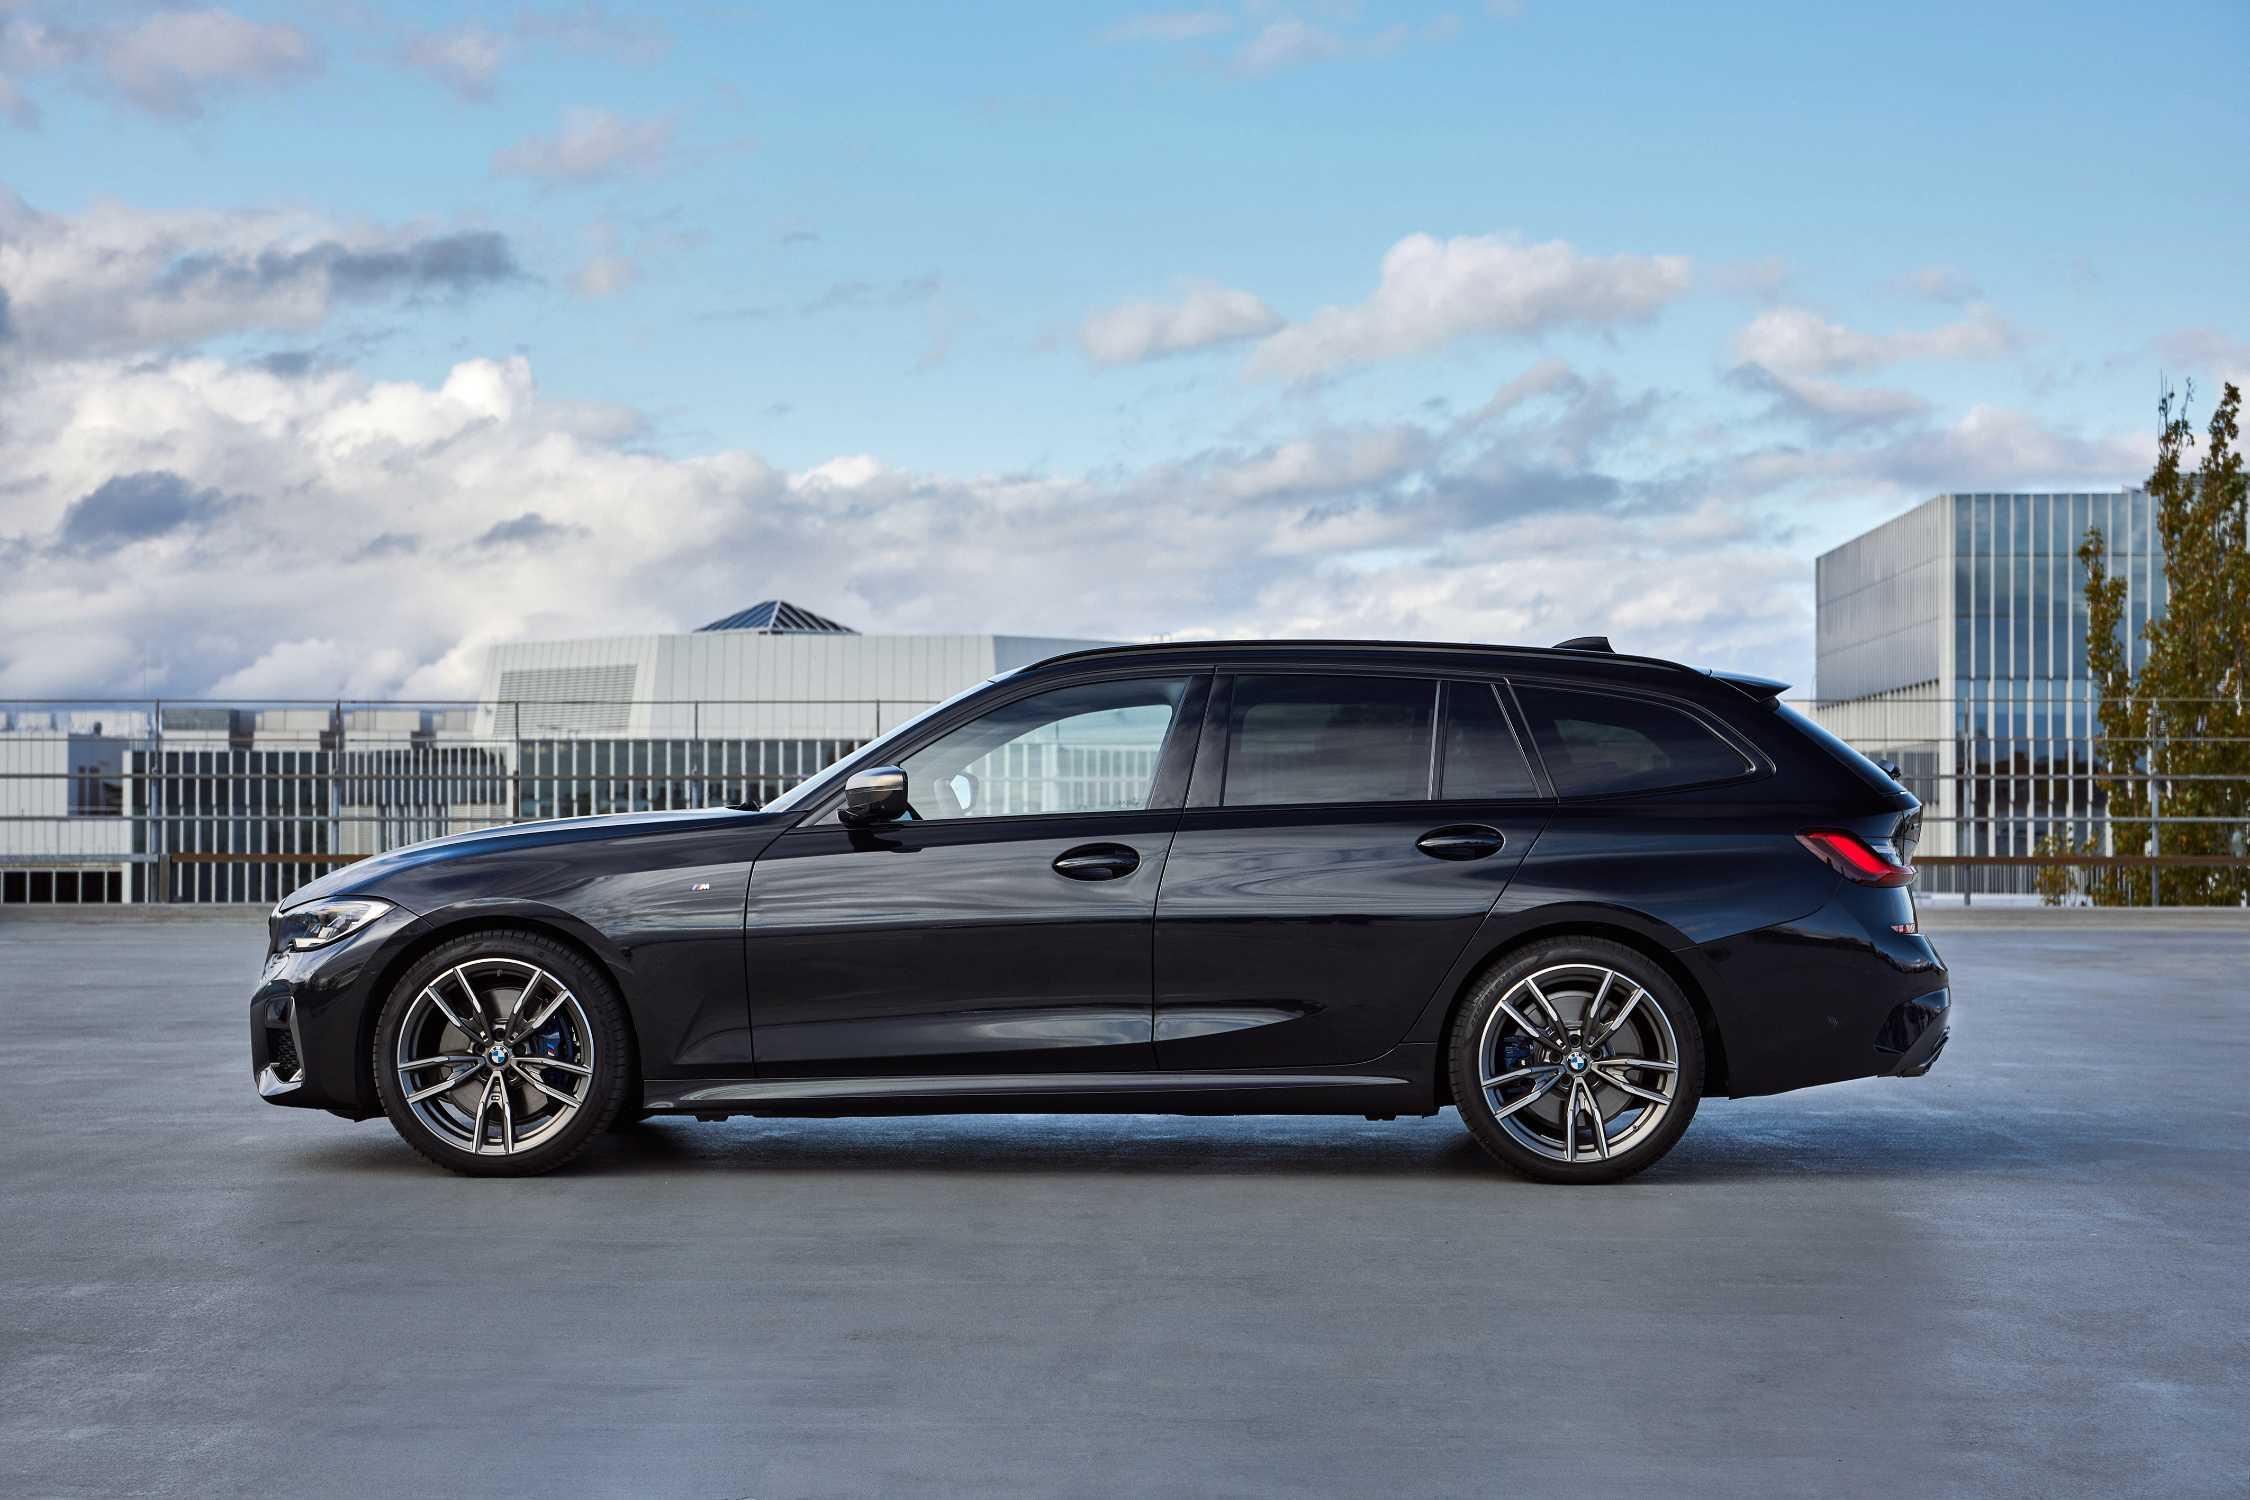 The New Bmw M340i Xdrive Touring Black Sapphire Metallic 10 2019